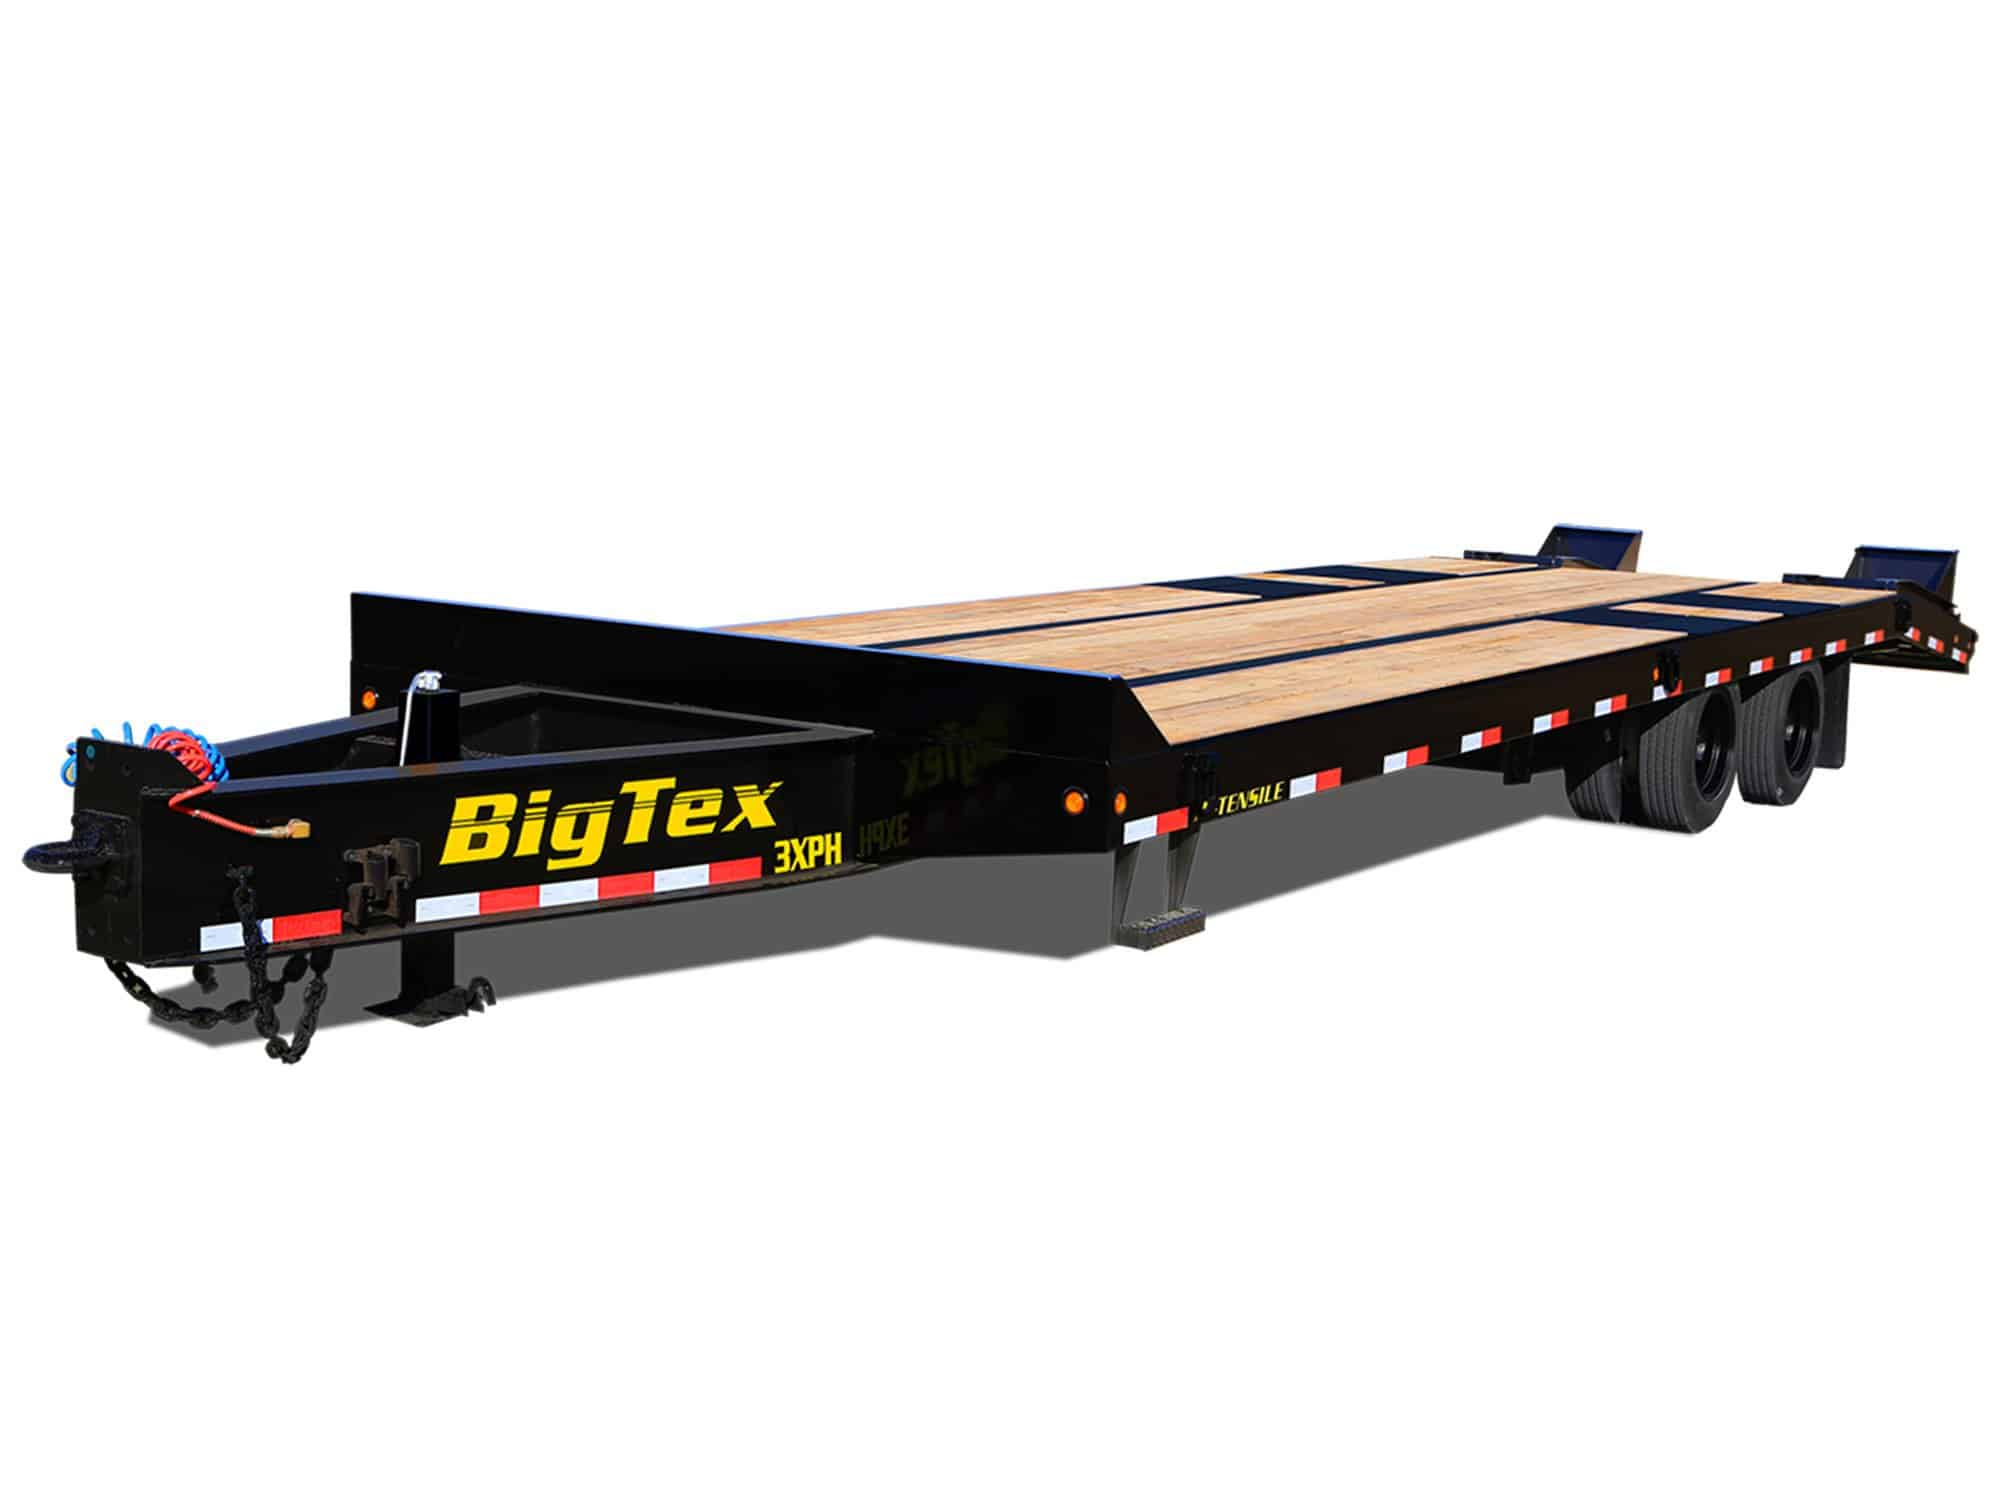 super heavy duty deck over equipment hauler